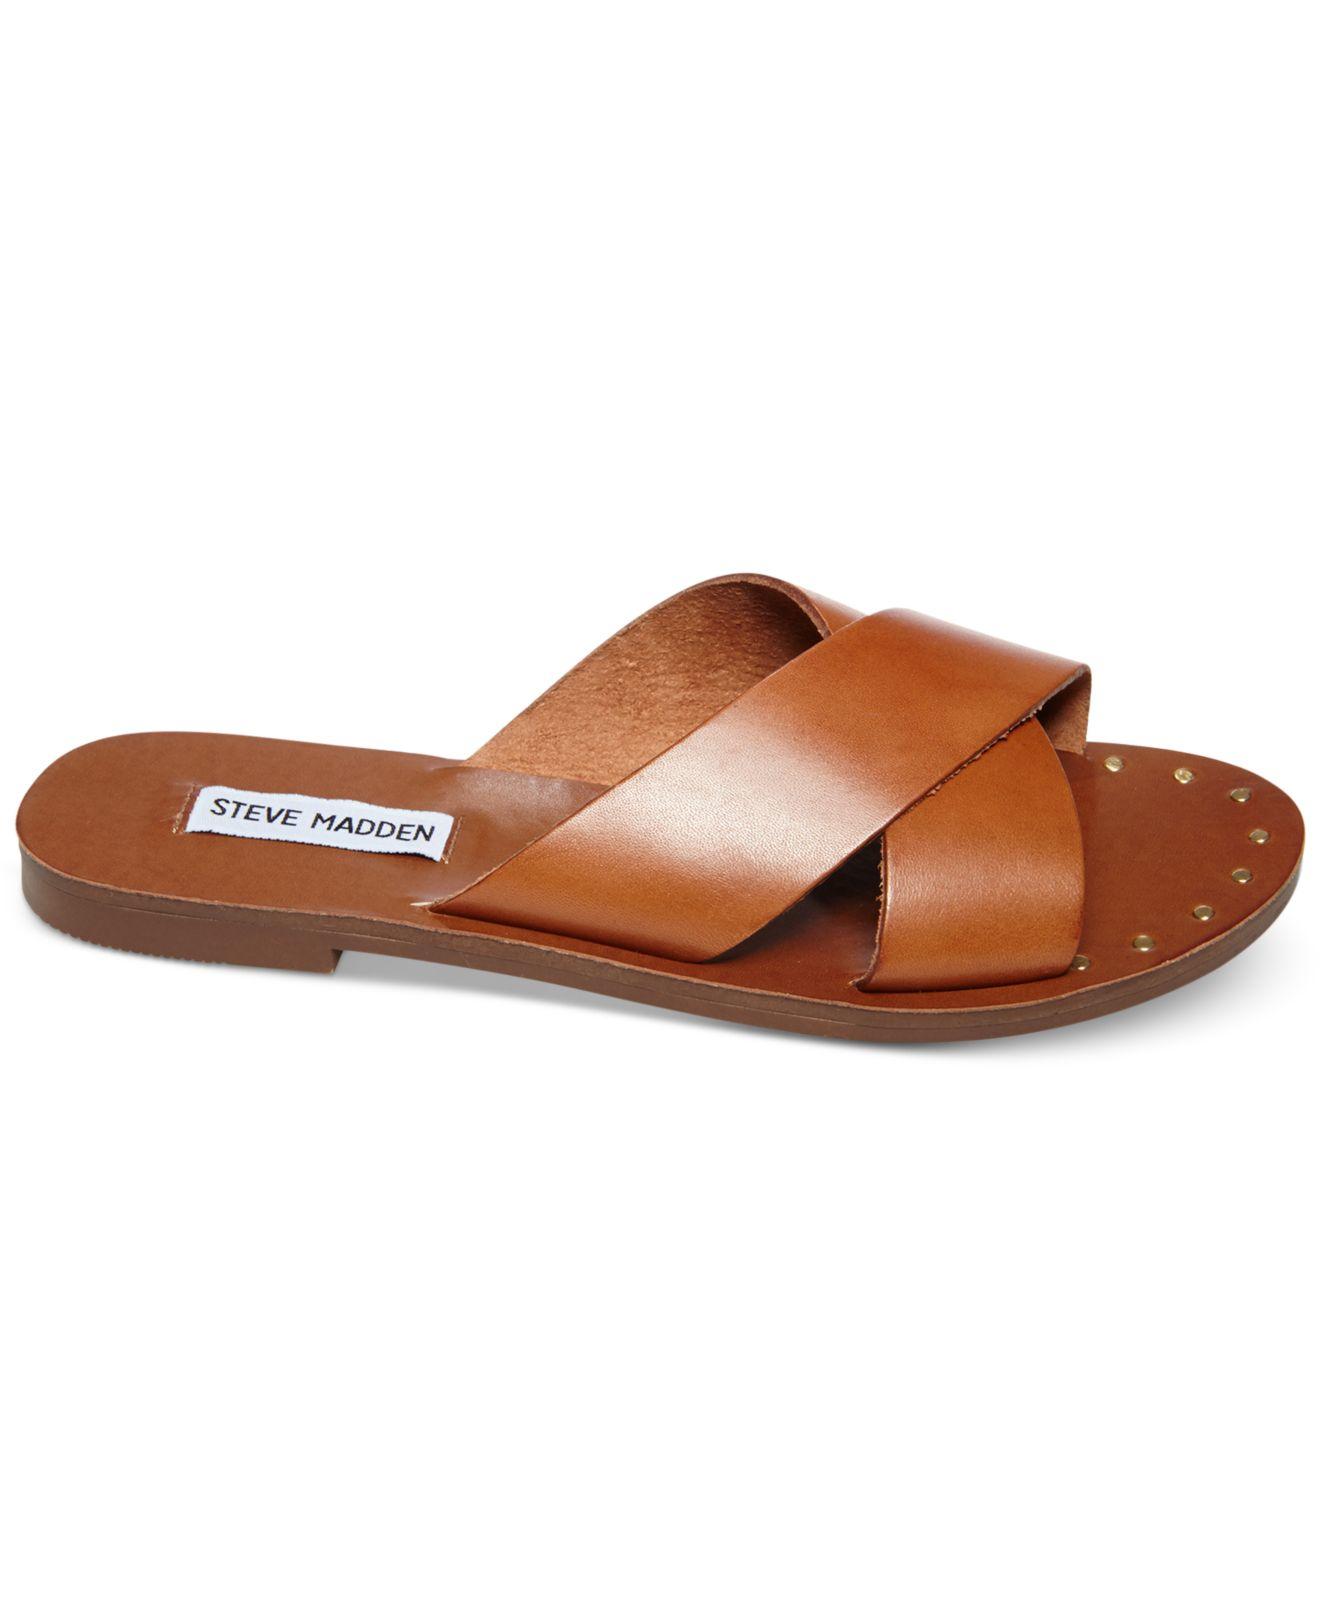 20e6dd05e Steve Madden Dryzzle Crisscross Sandals in Brown - Lyst